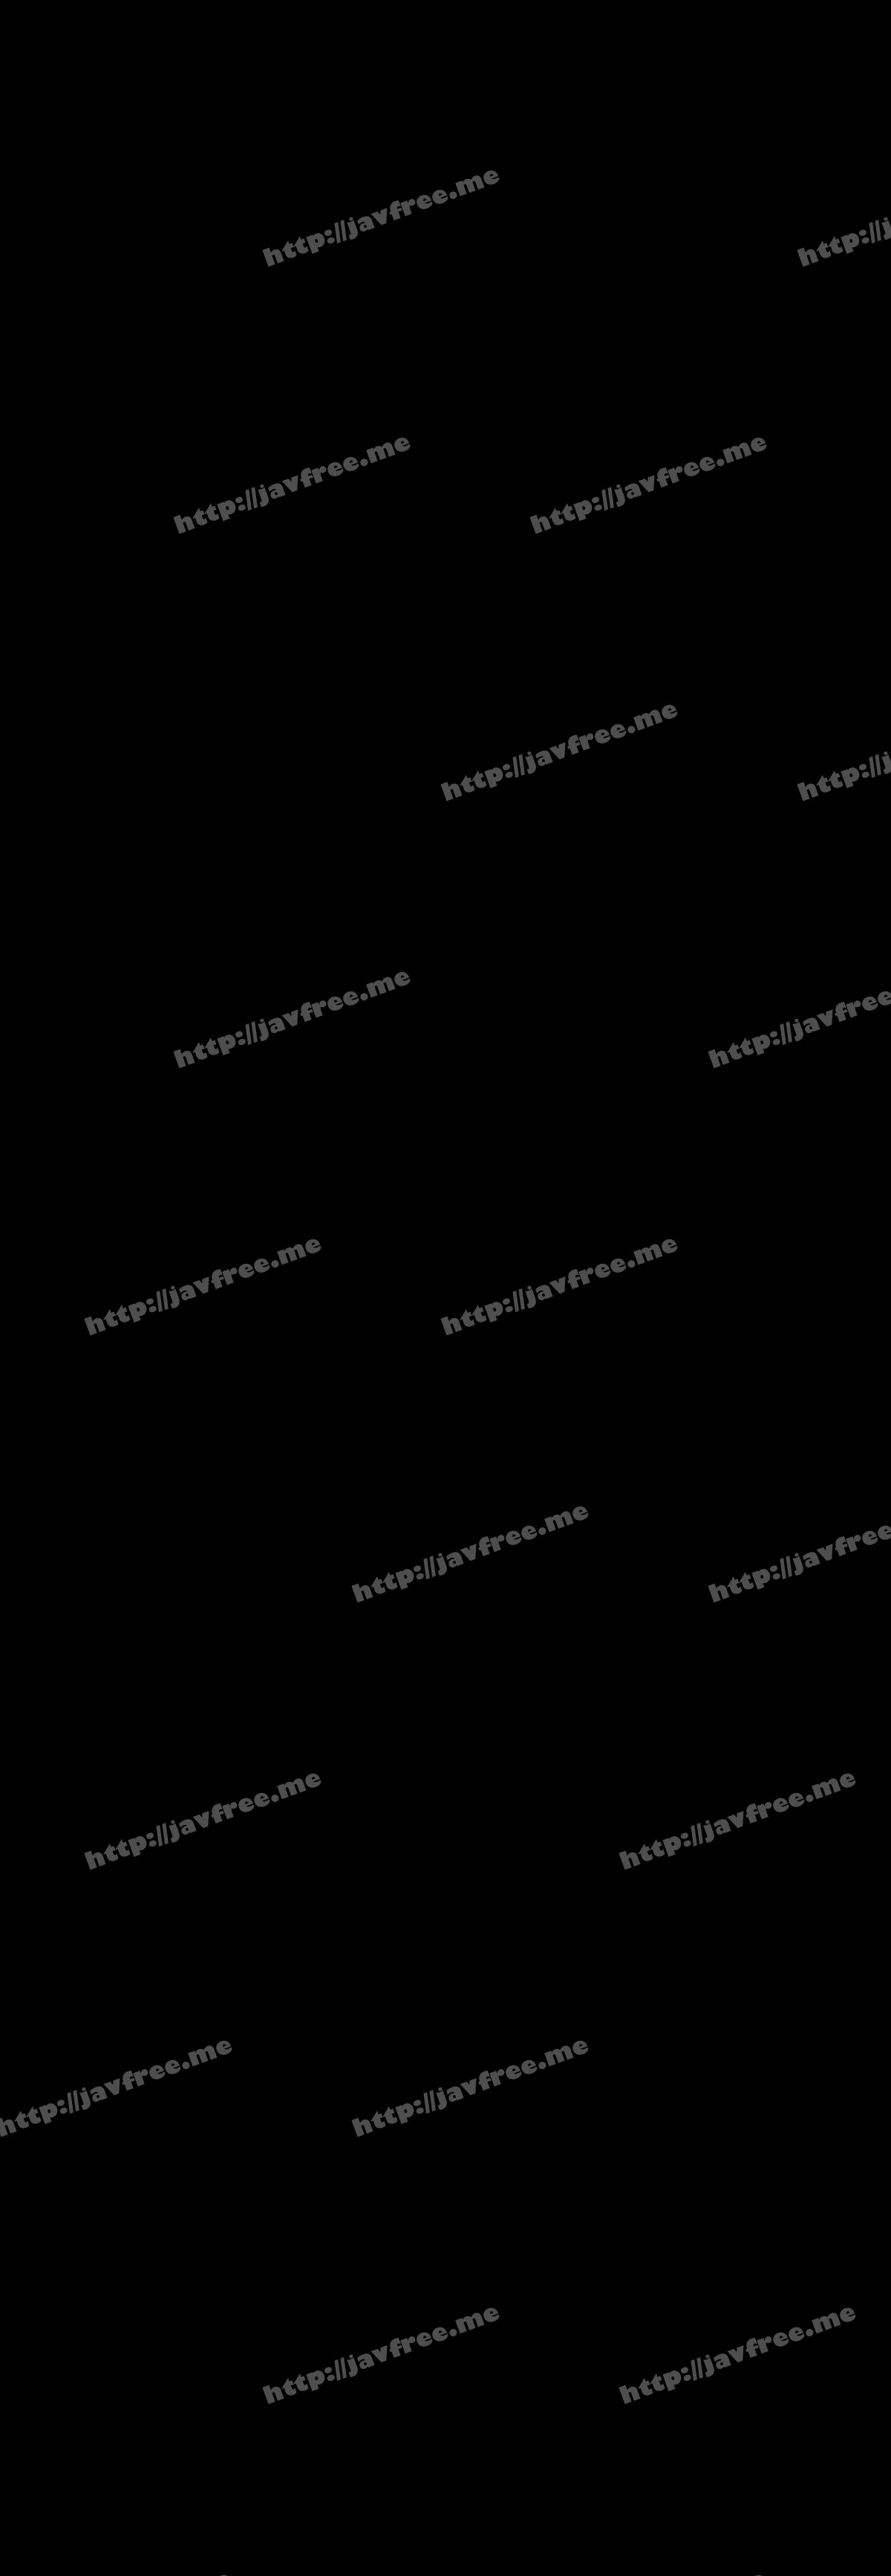 [HD][TB-001] 独占!着エロアイドル渚野洋子AV Debut!ベロチューたっぷり本気レズH!極太双頭ディルドで連続絶頂!/渚野洋子 川越ユイ BD(ブルーレイディスク) - image TB-001-720p on https://javfree.me